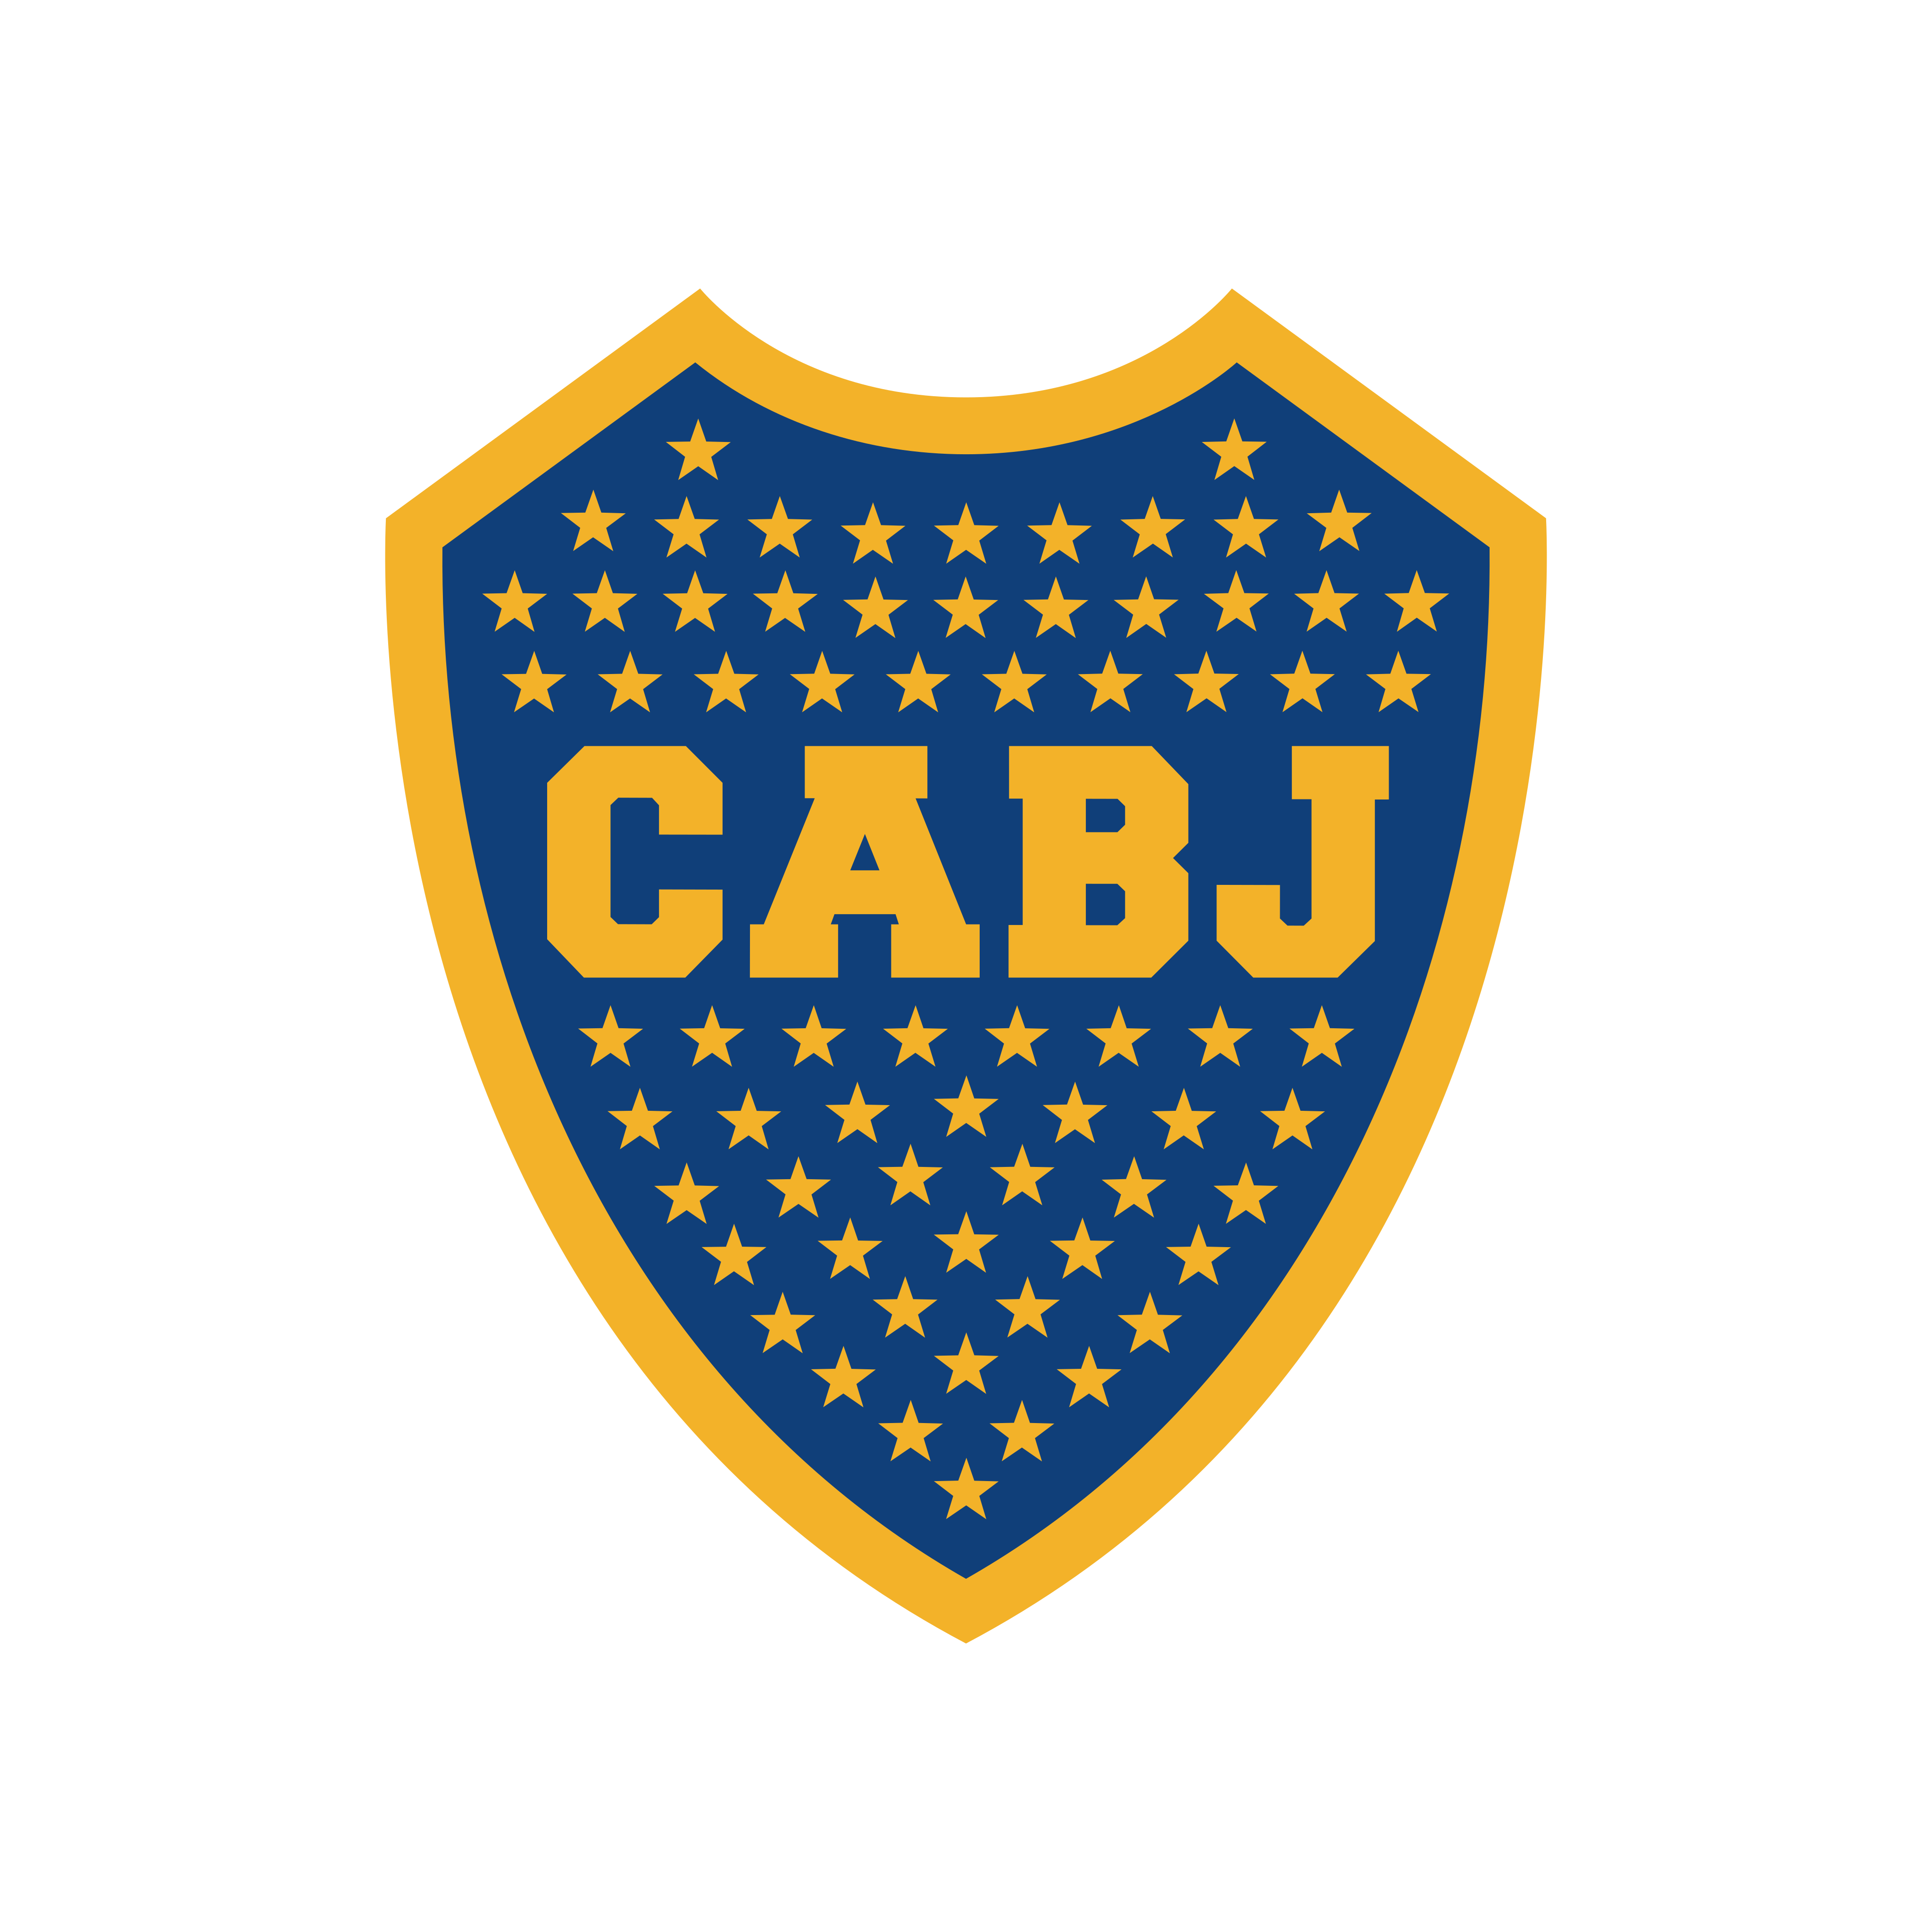 boca juniors logo escudo 0 - Boca Juniors Logo - Escudo